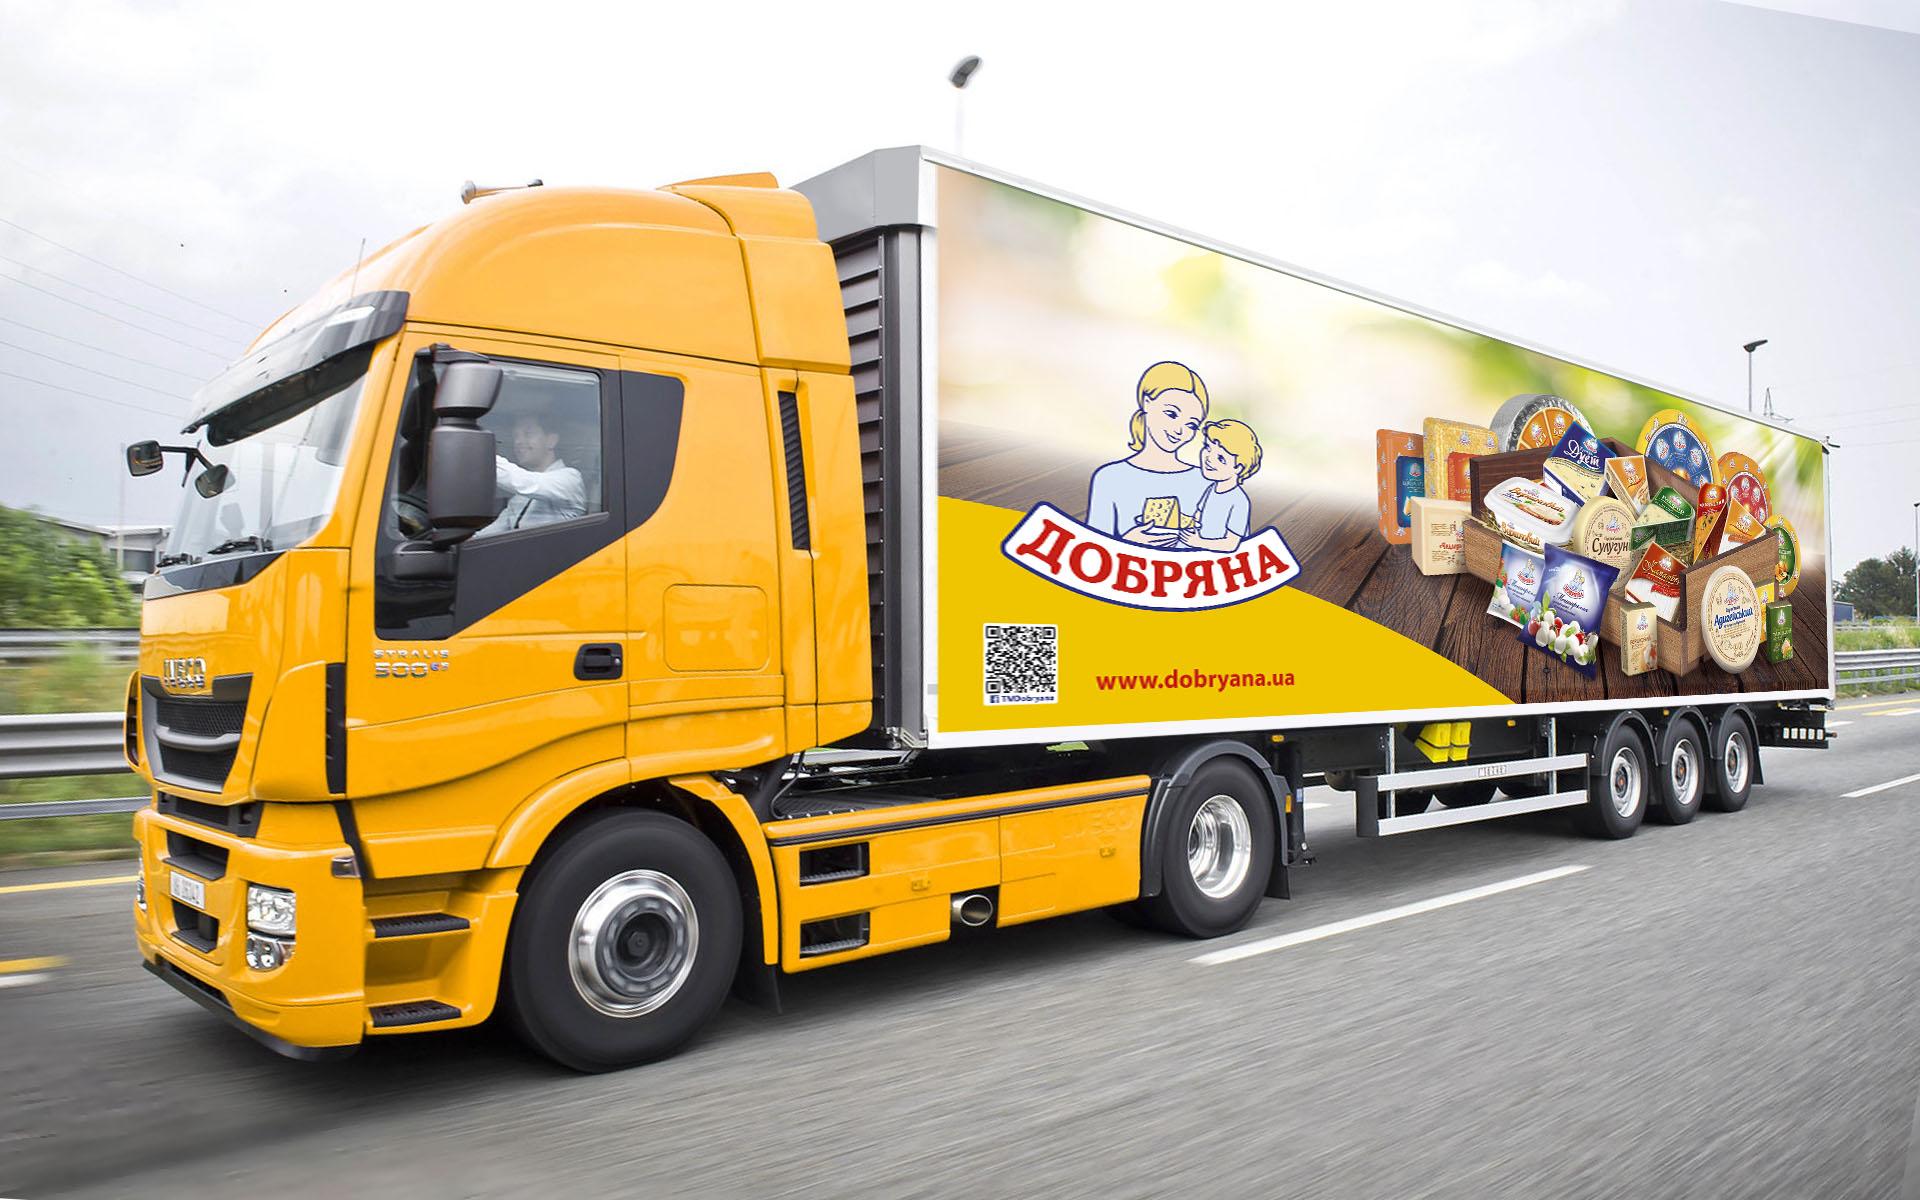 Брендирование транспорта, реклама на транспорте